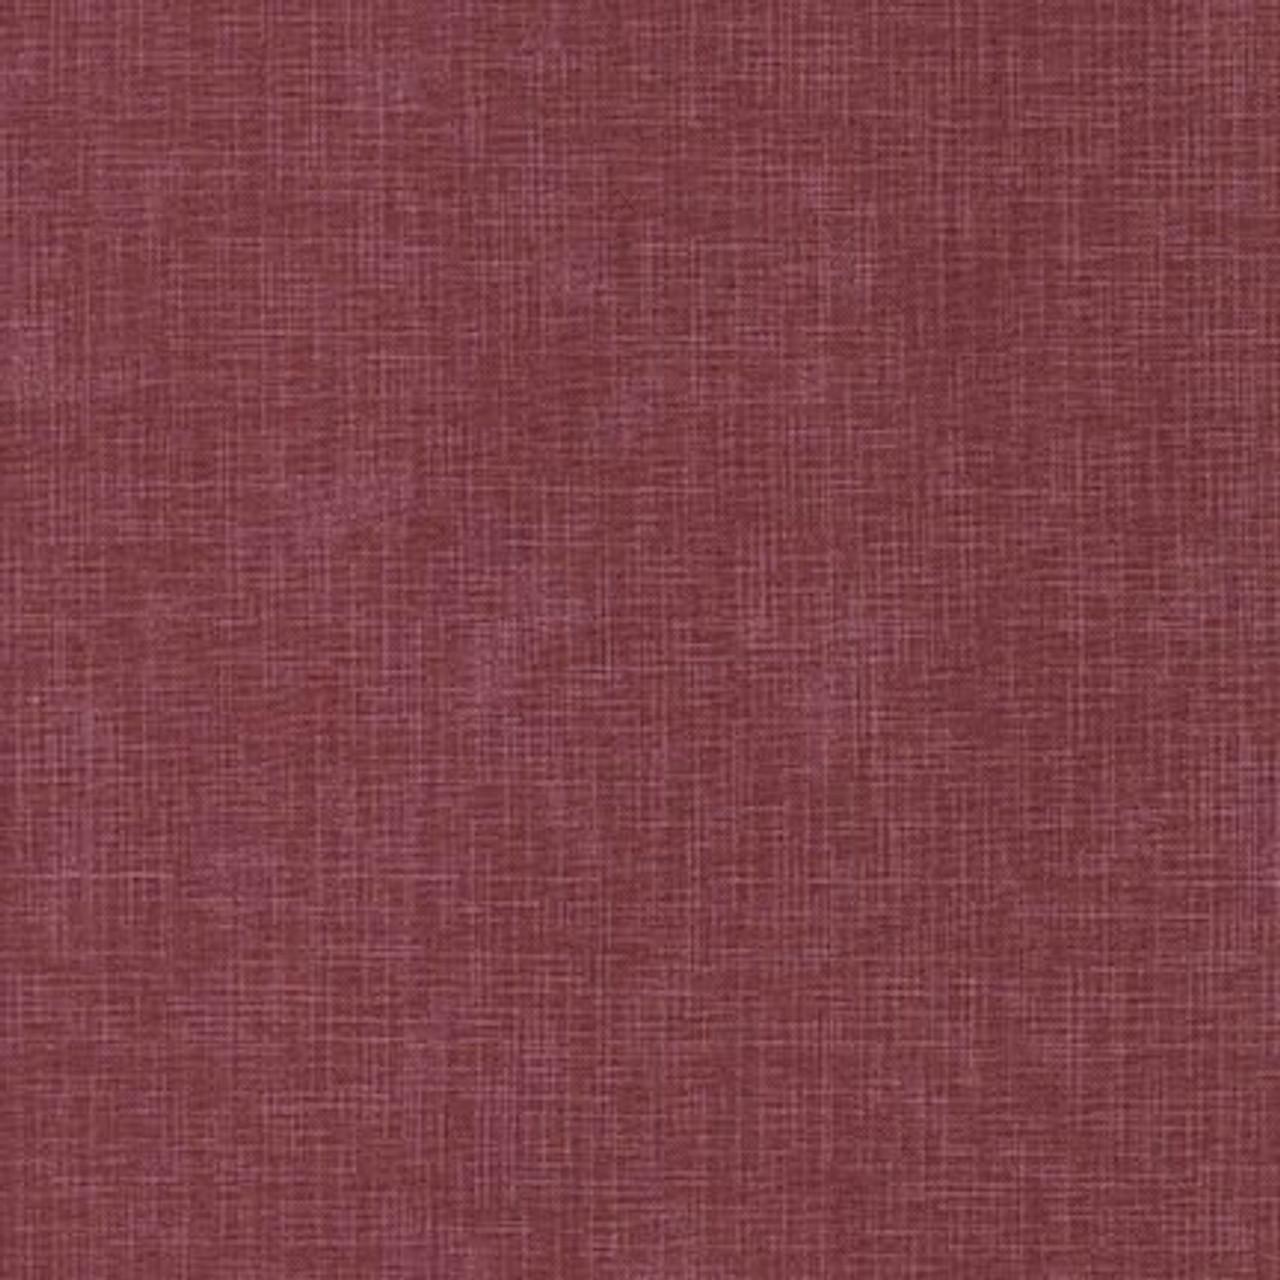 100% Cotton linen look - Berry